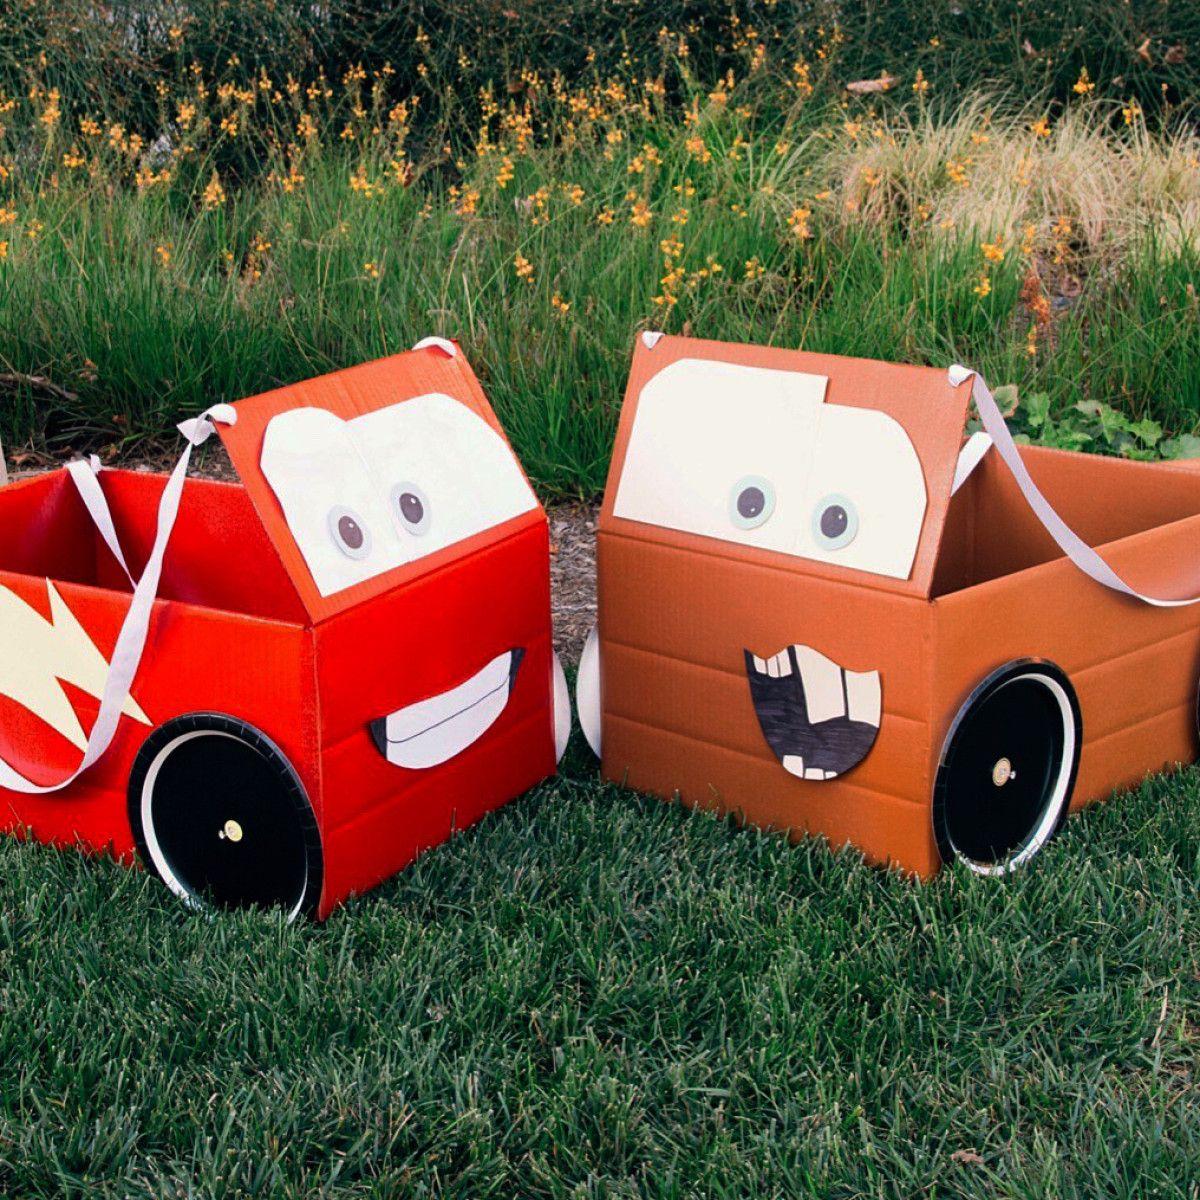 McQueen & Mater Box Car Costumes